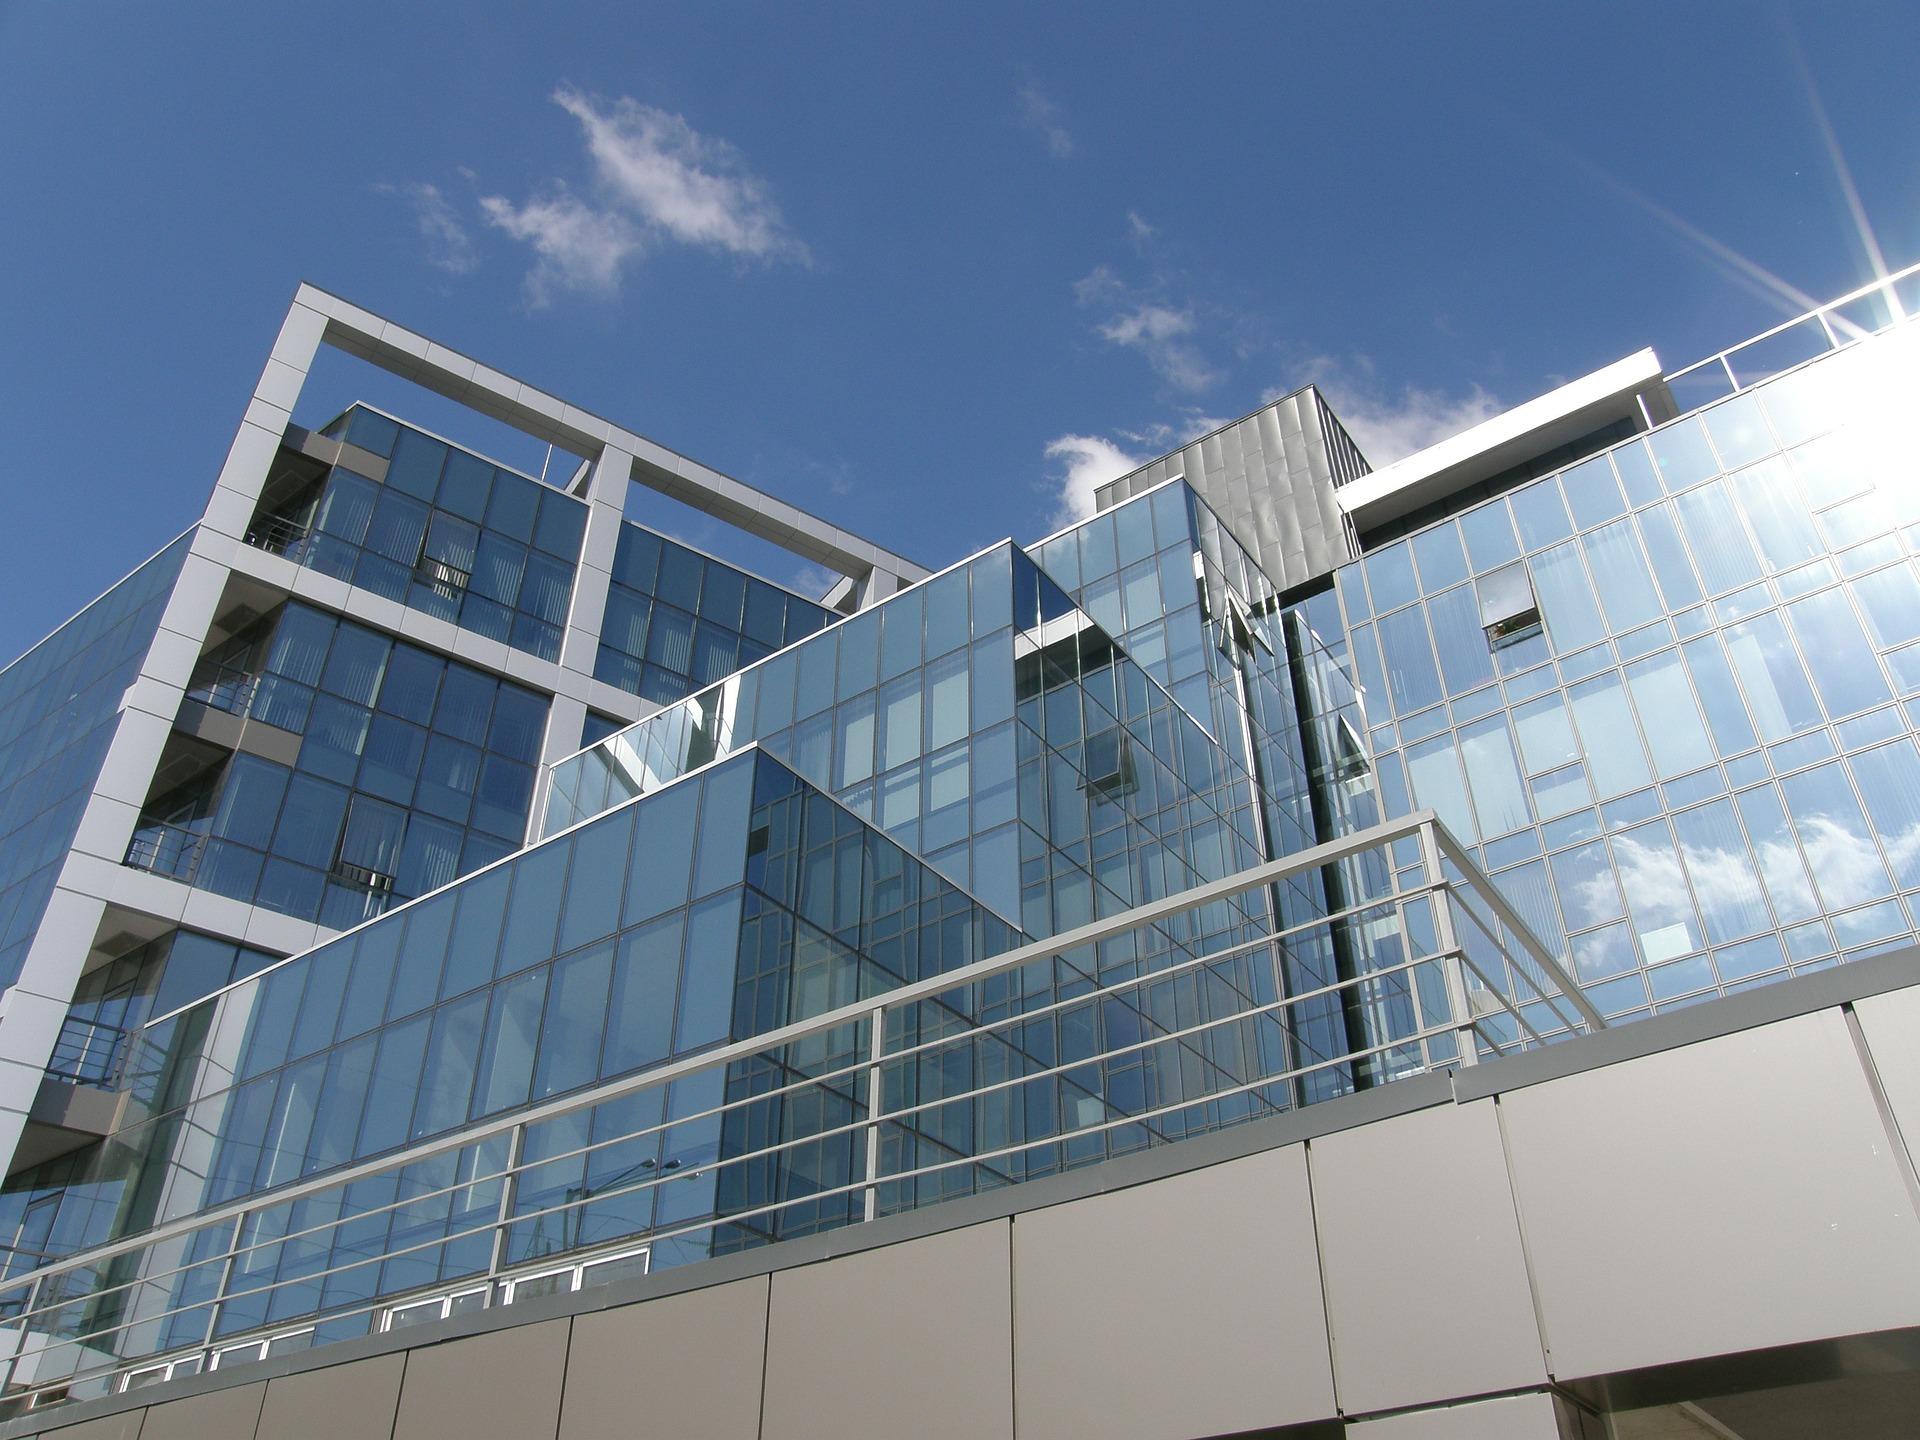 Commercial windows in Ottawa